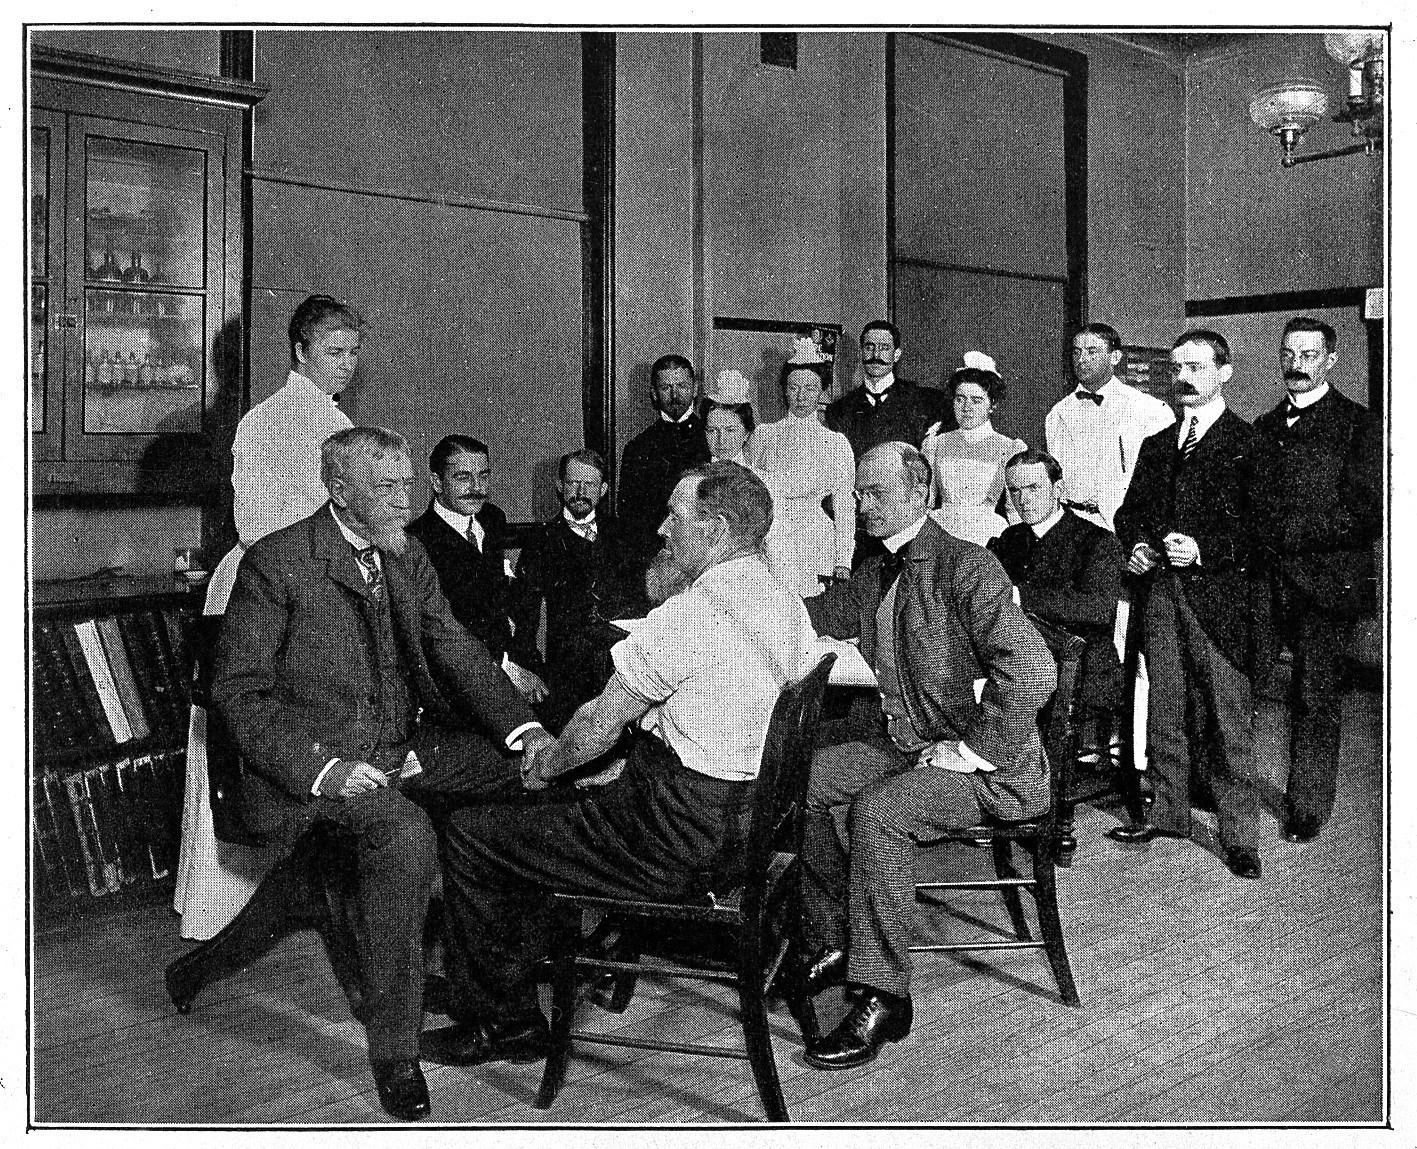 s.-weir-mitchell-examining-a-civil-war-veteran-at-the-clinic-of-the-orthopaedic-hospital-philadelphia.jpg